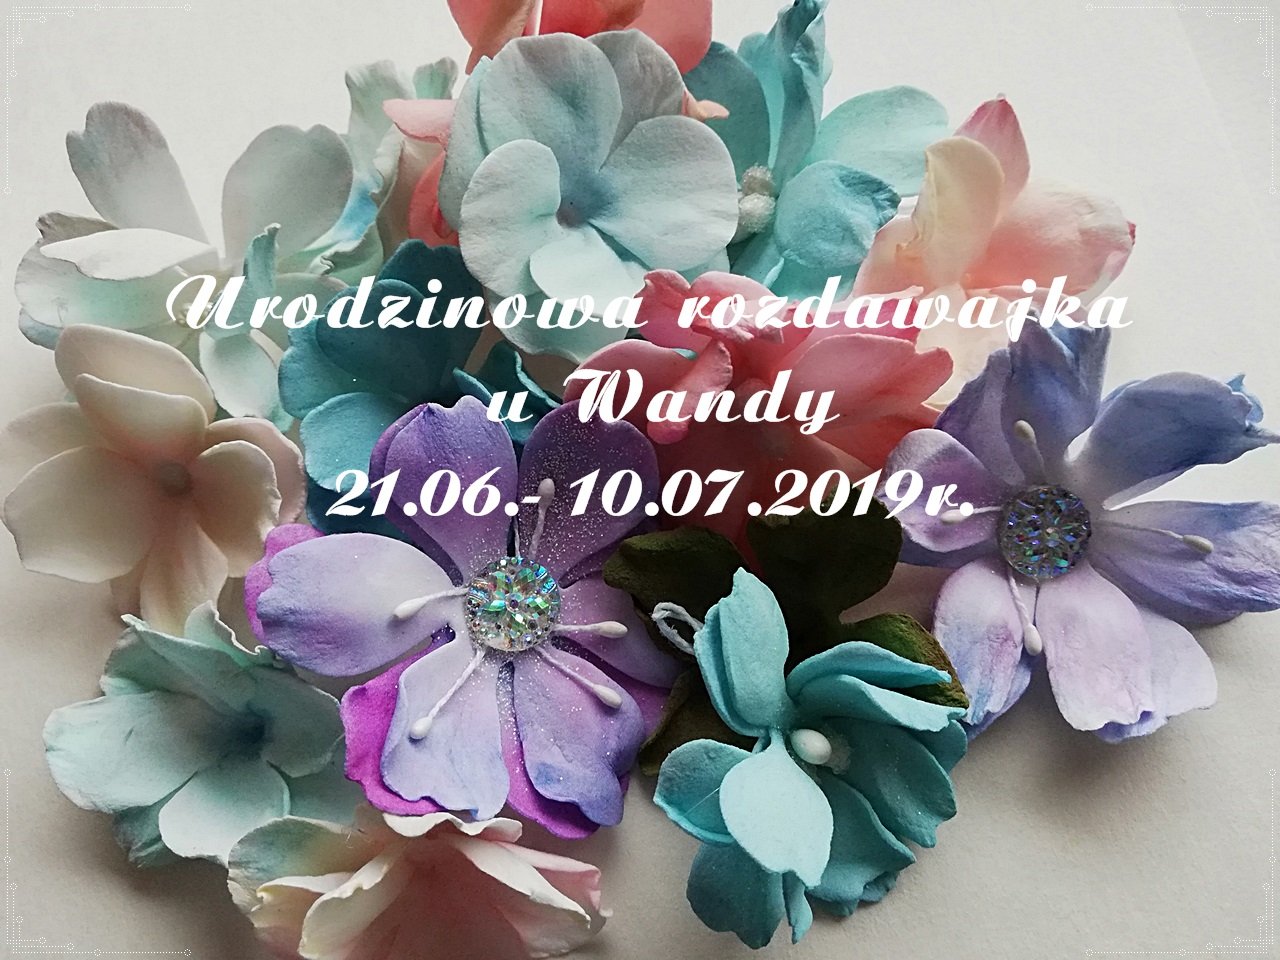 Candy u Wandy :)